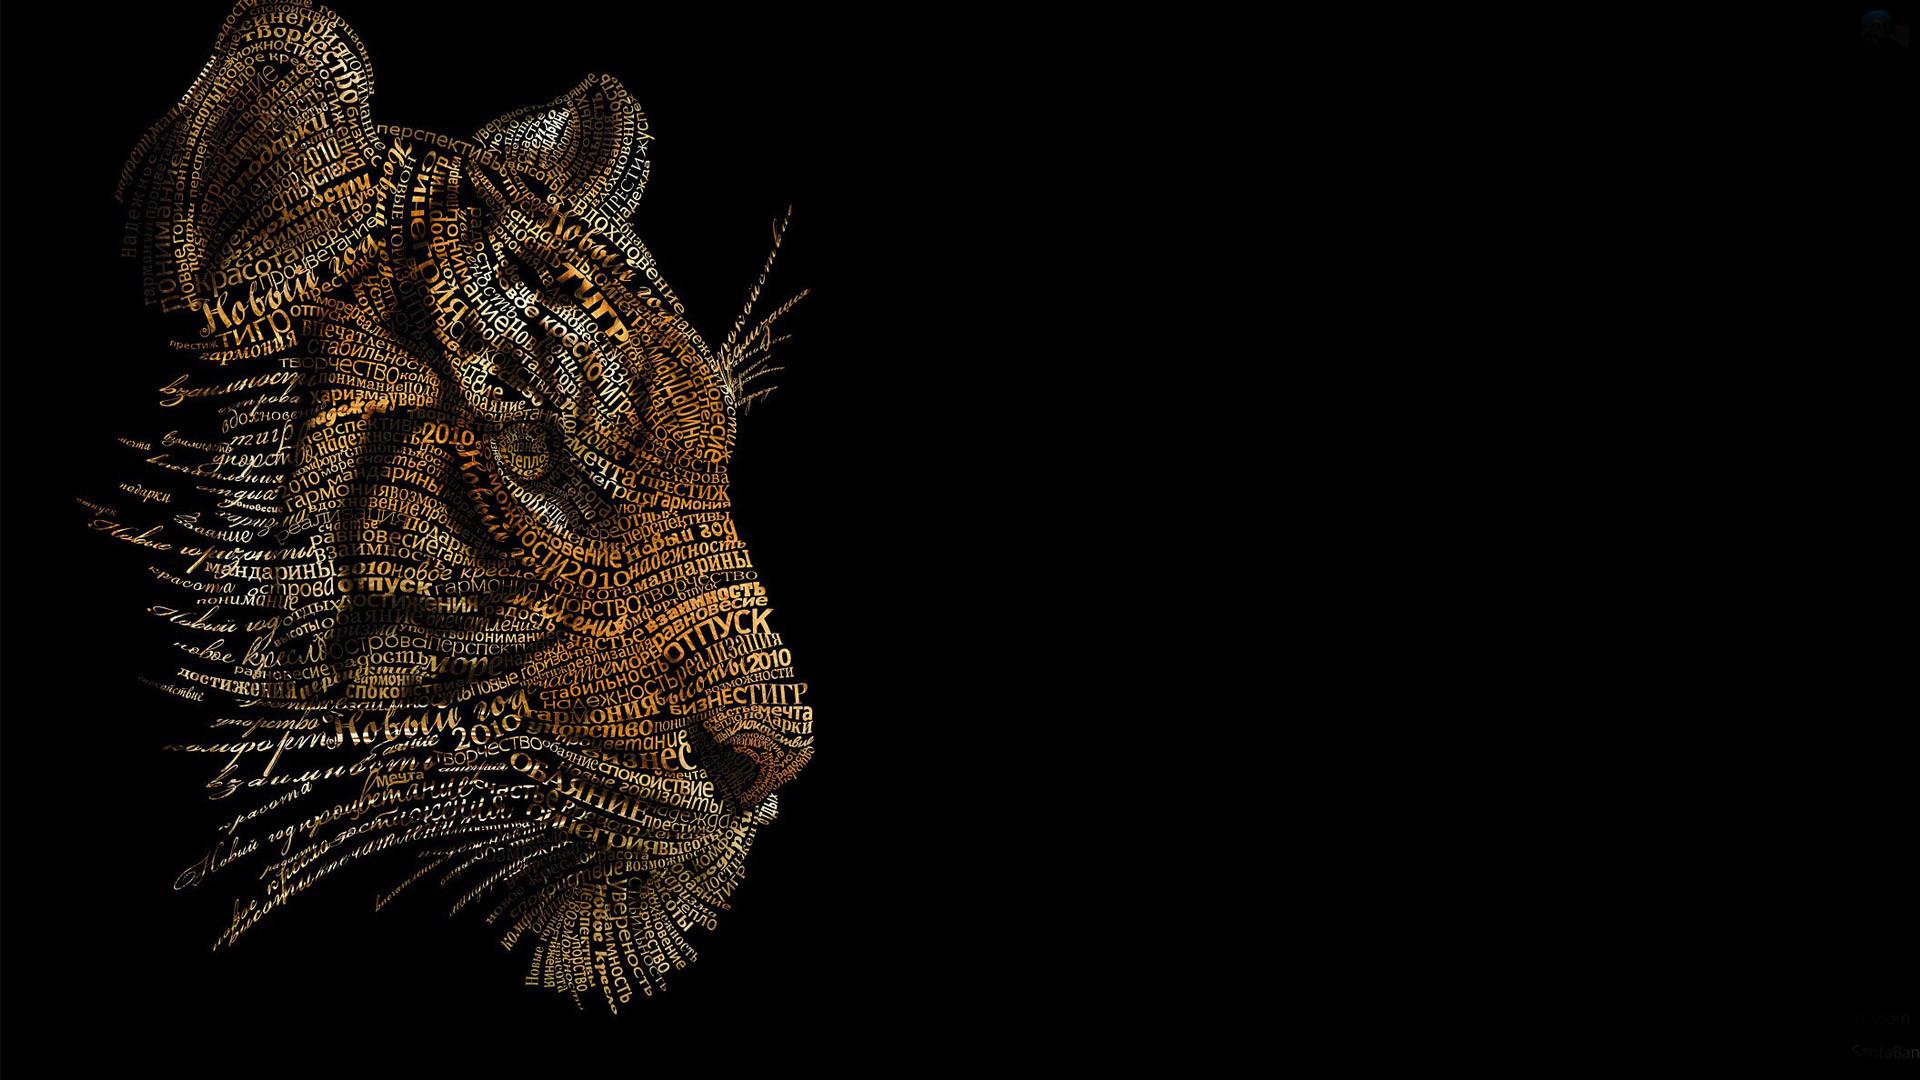 Animal Abstract 1080p Wallpaper image